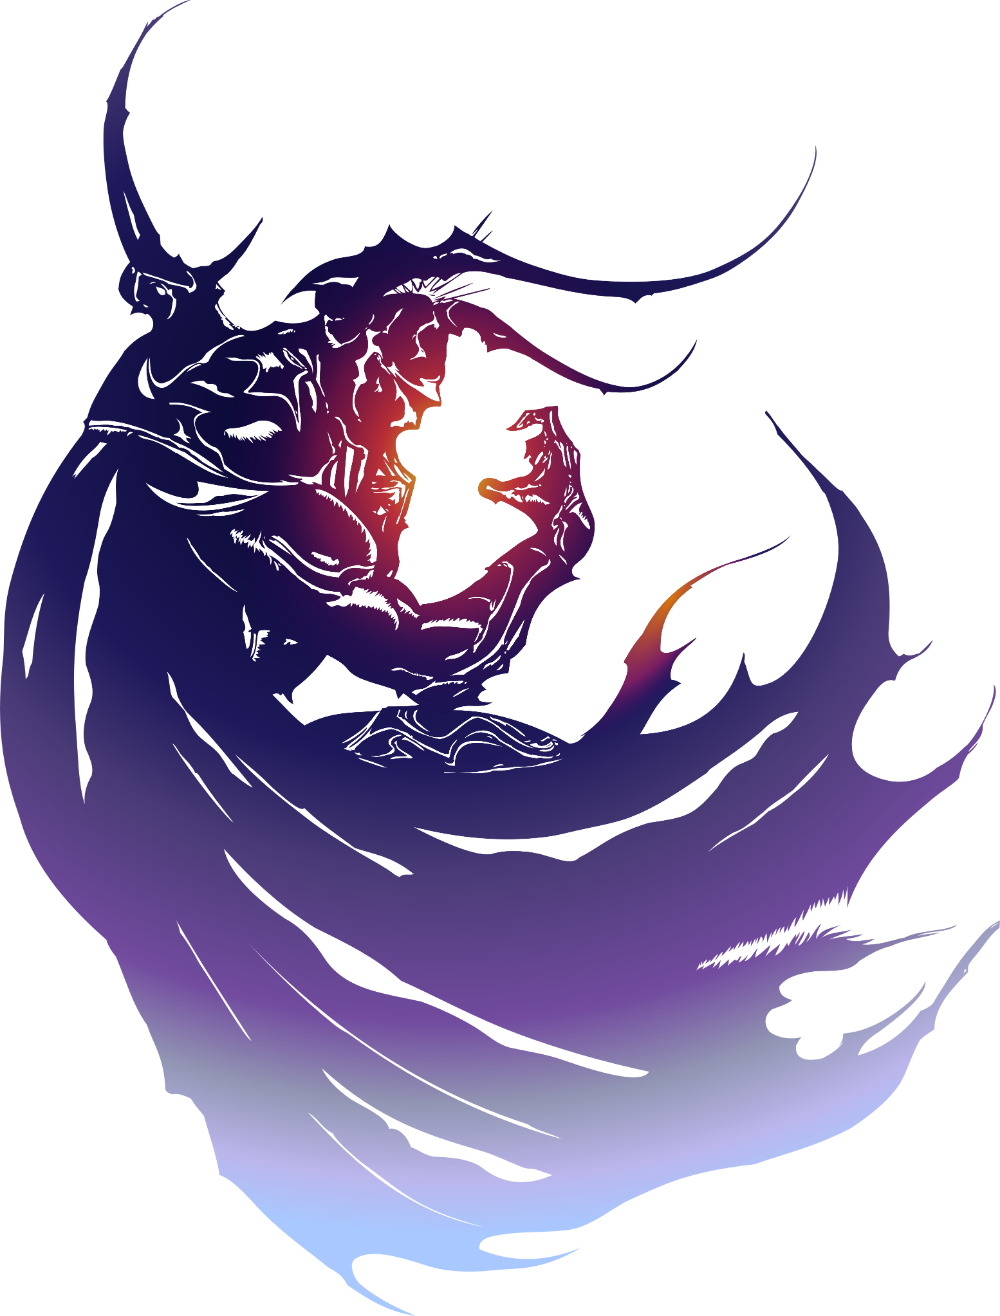 Final Fantasy Iv Logo By Eldi13 On Deviantart Final Fantasy Iv Final Fantasy Tattoo Final Fantasy Logo